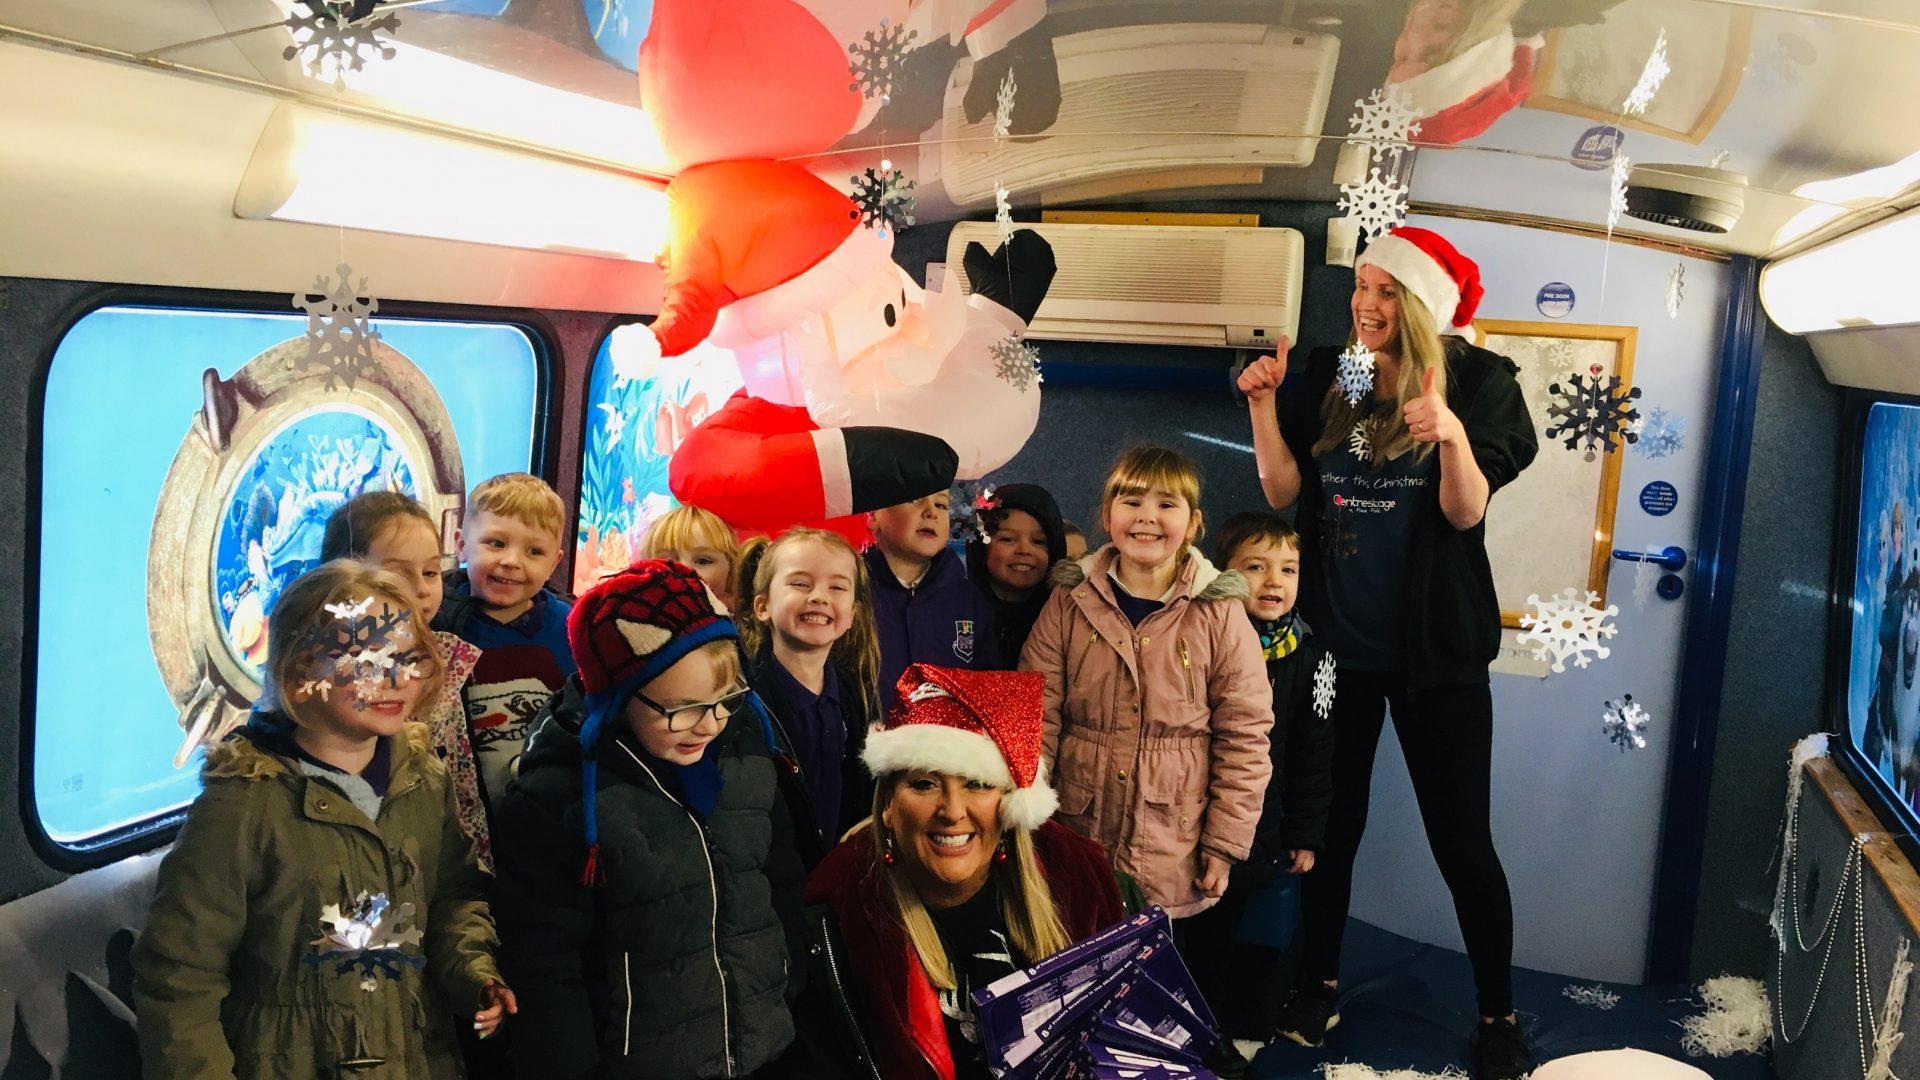 All aboard the Santa Bus